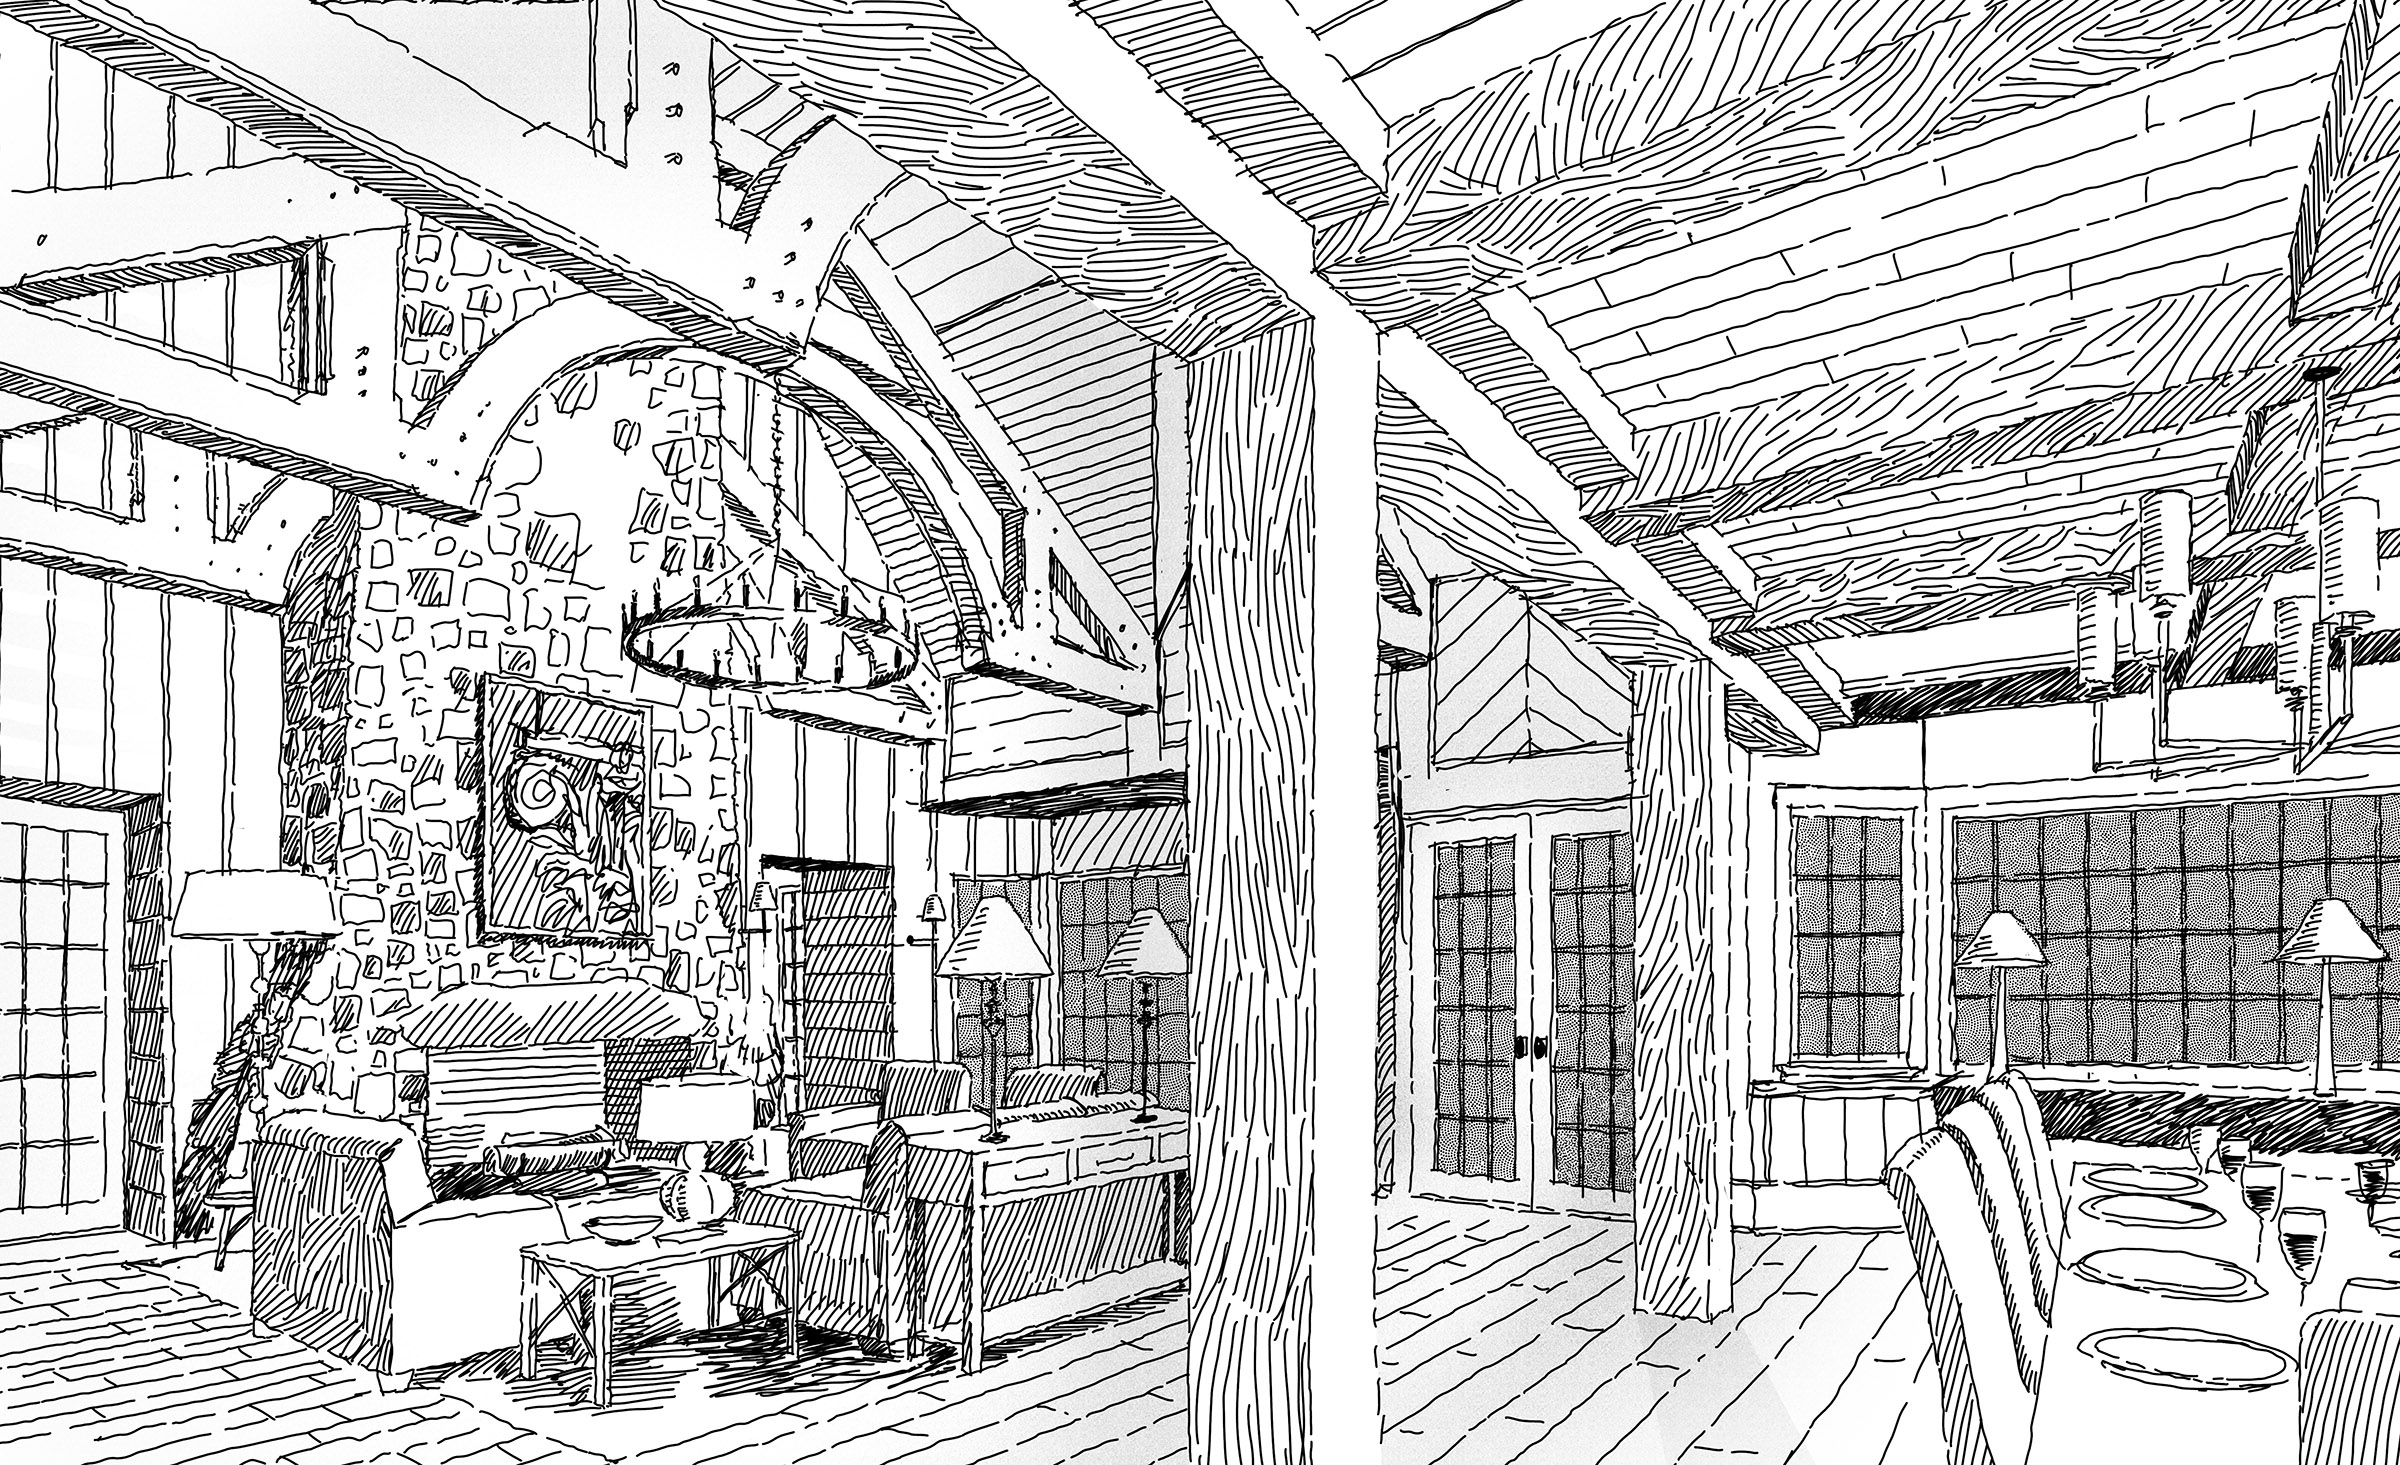 maddox_interior.jpg